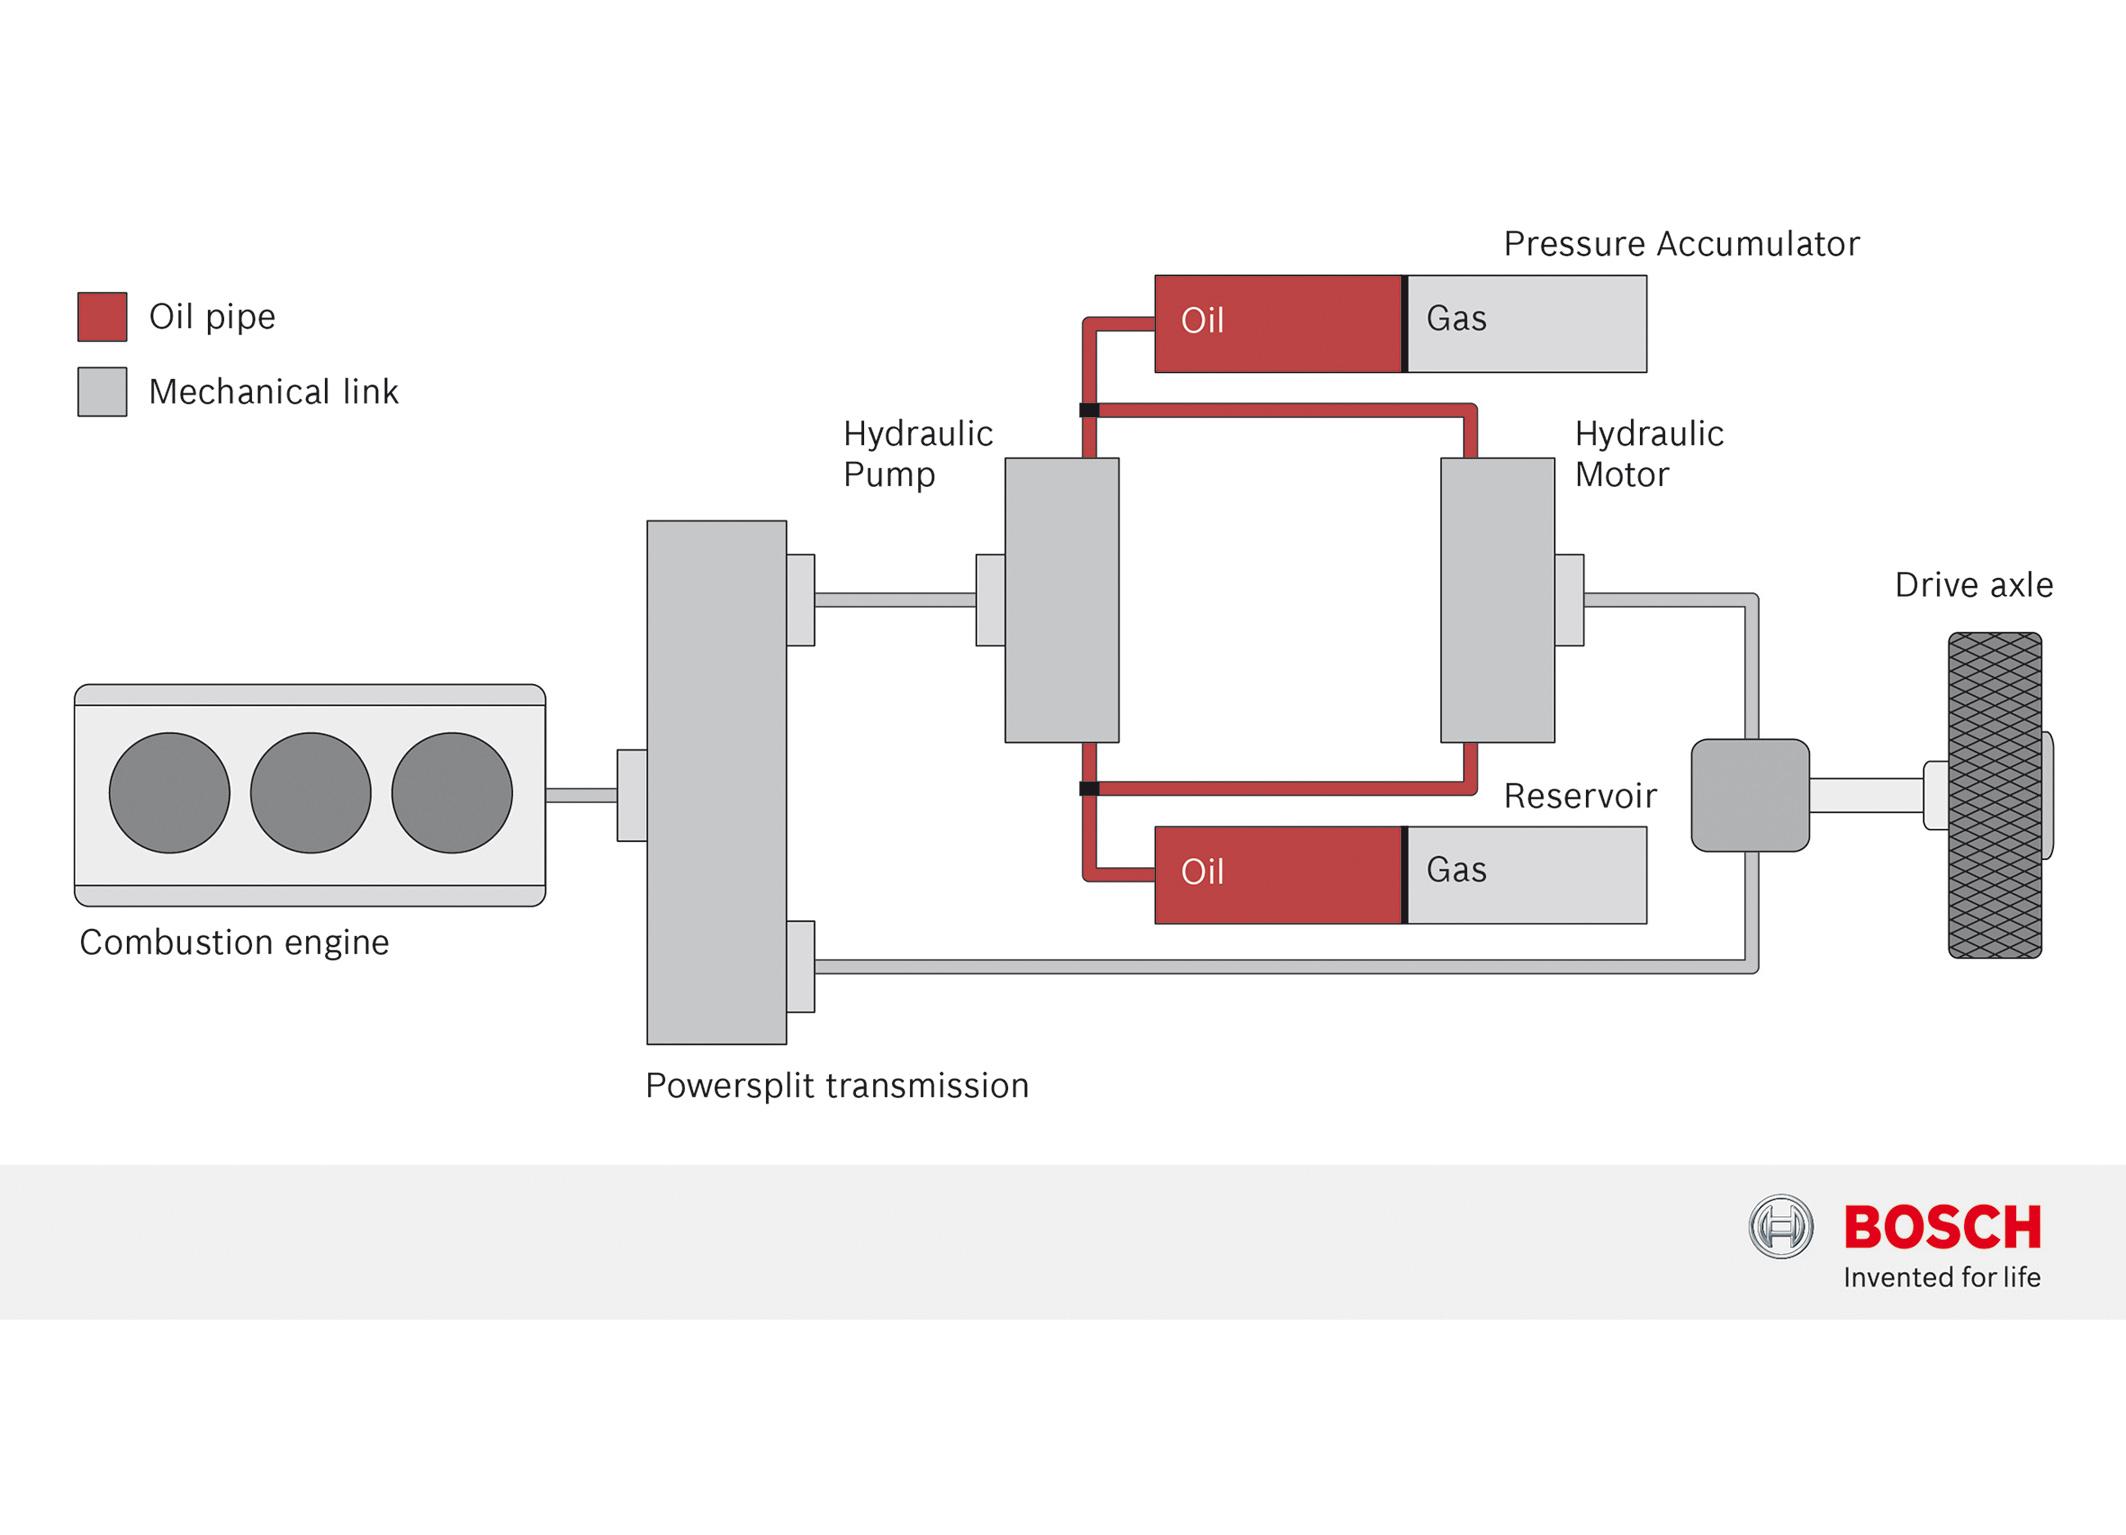 Schematics of hydraulic hybrid system